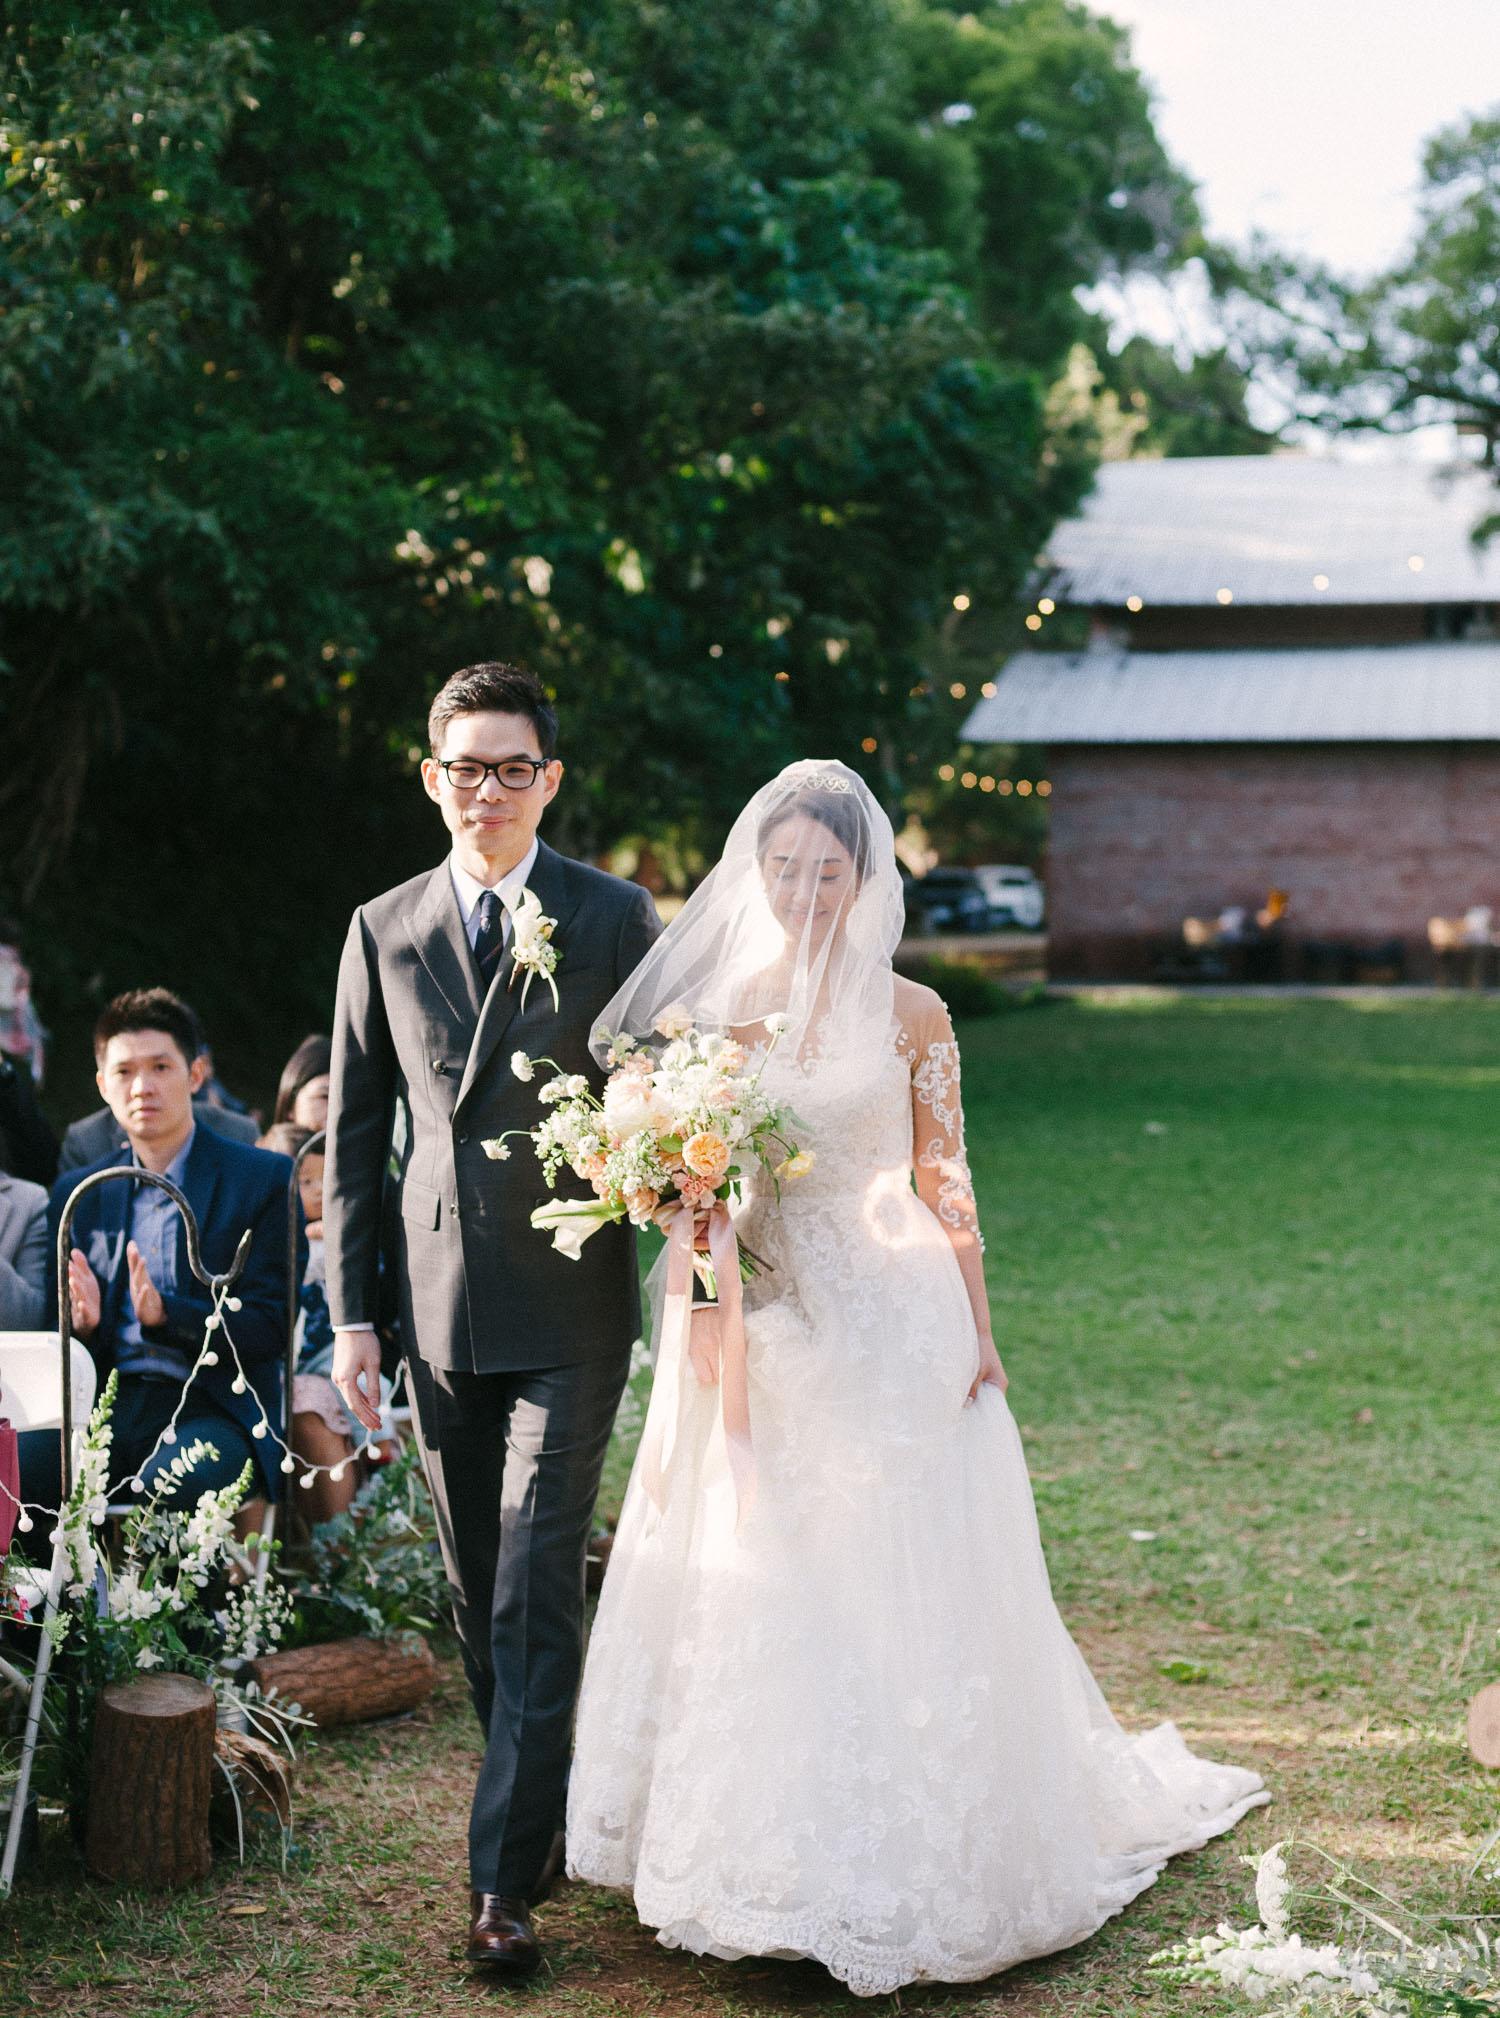 婚禮-顏氏牧場-底片-STAGE-Mark